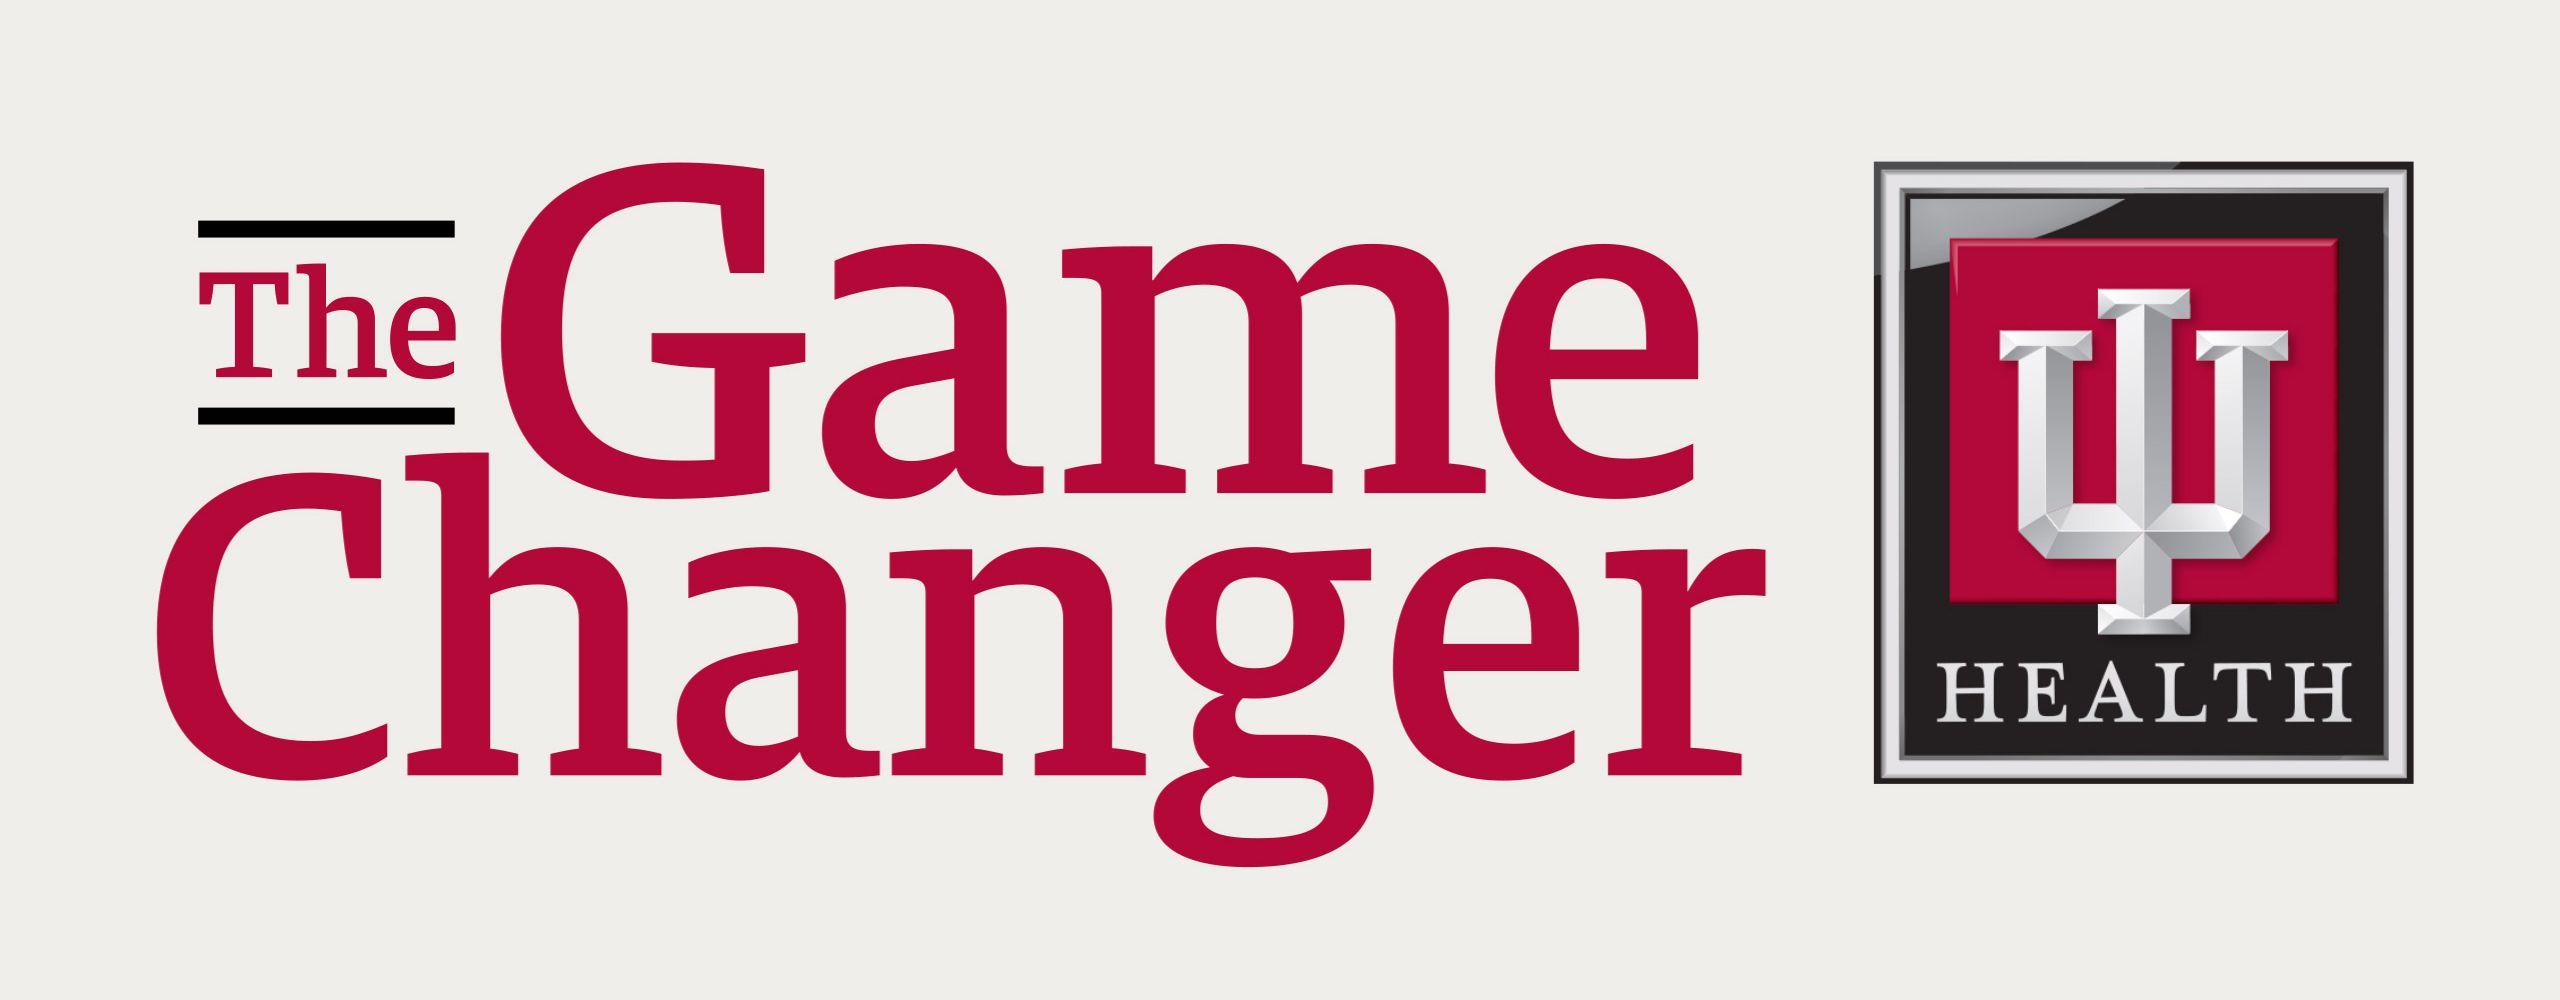 The Game Changer, IU Health